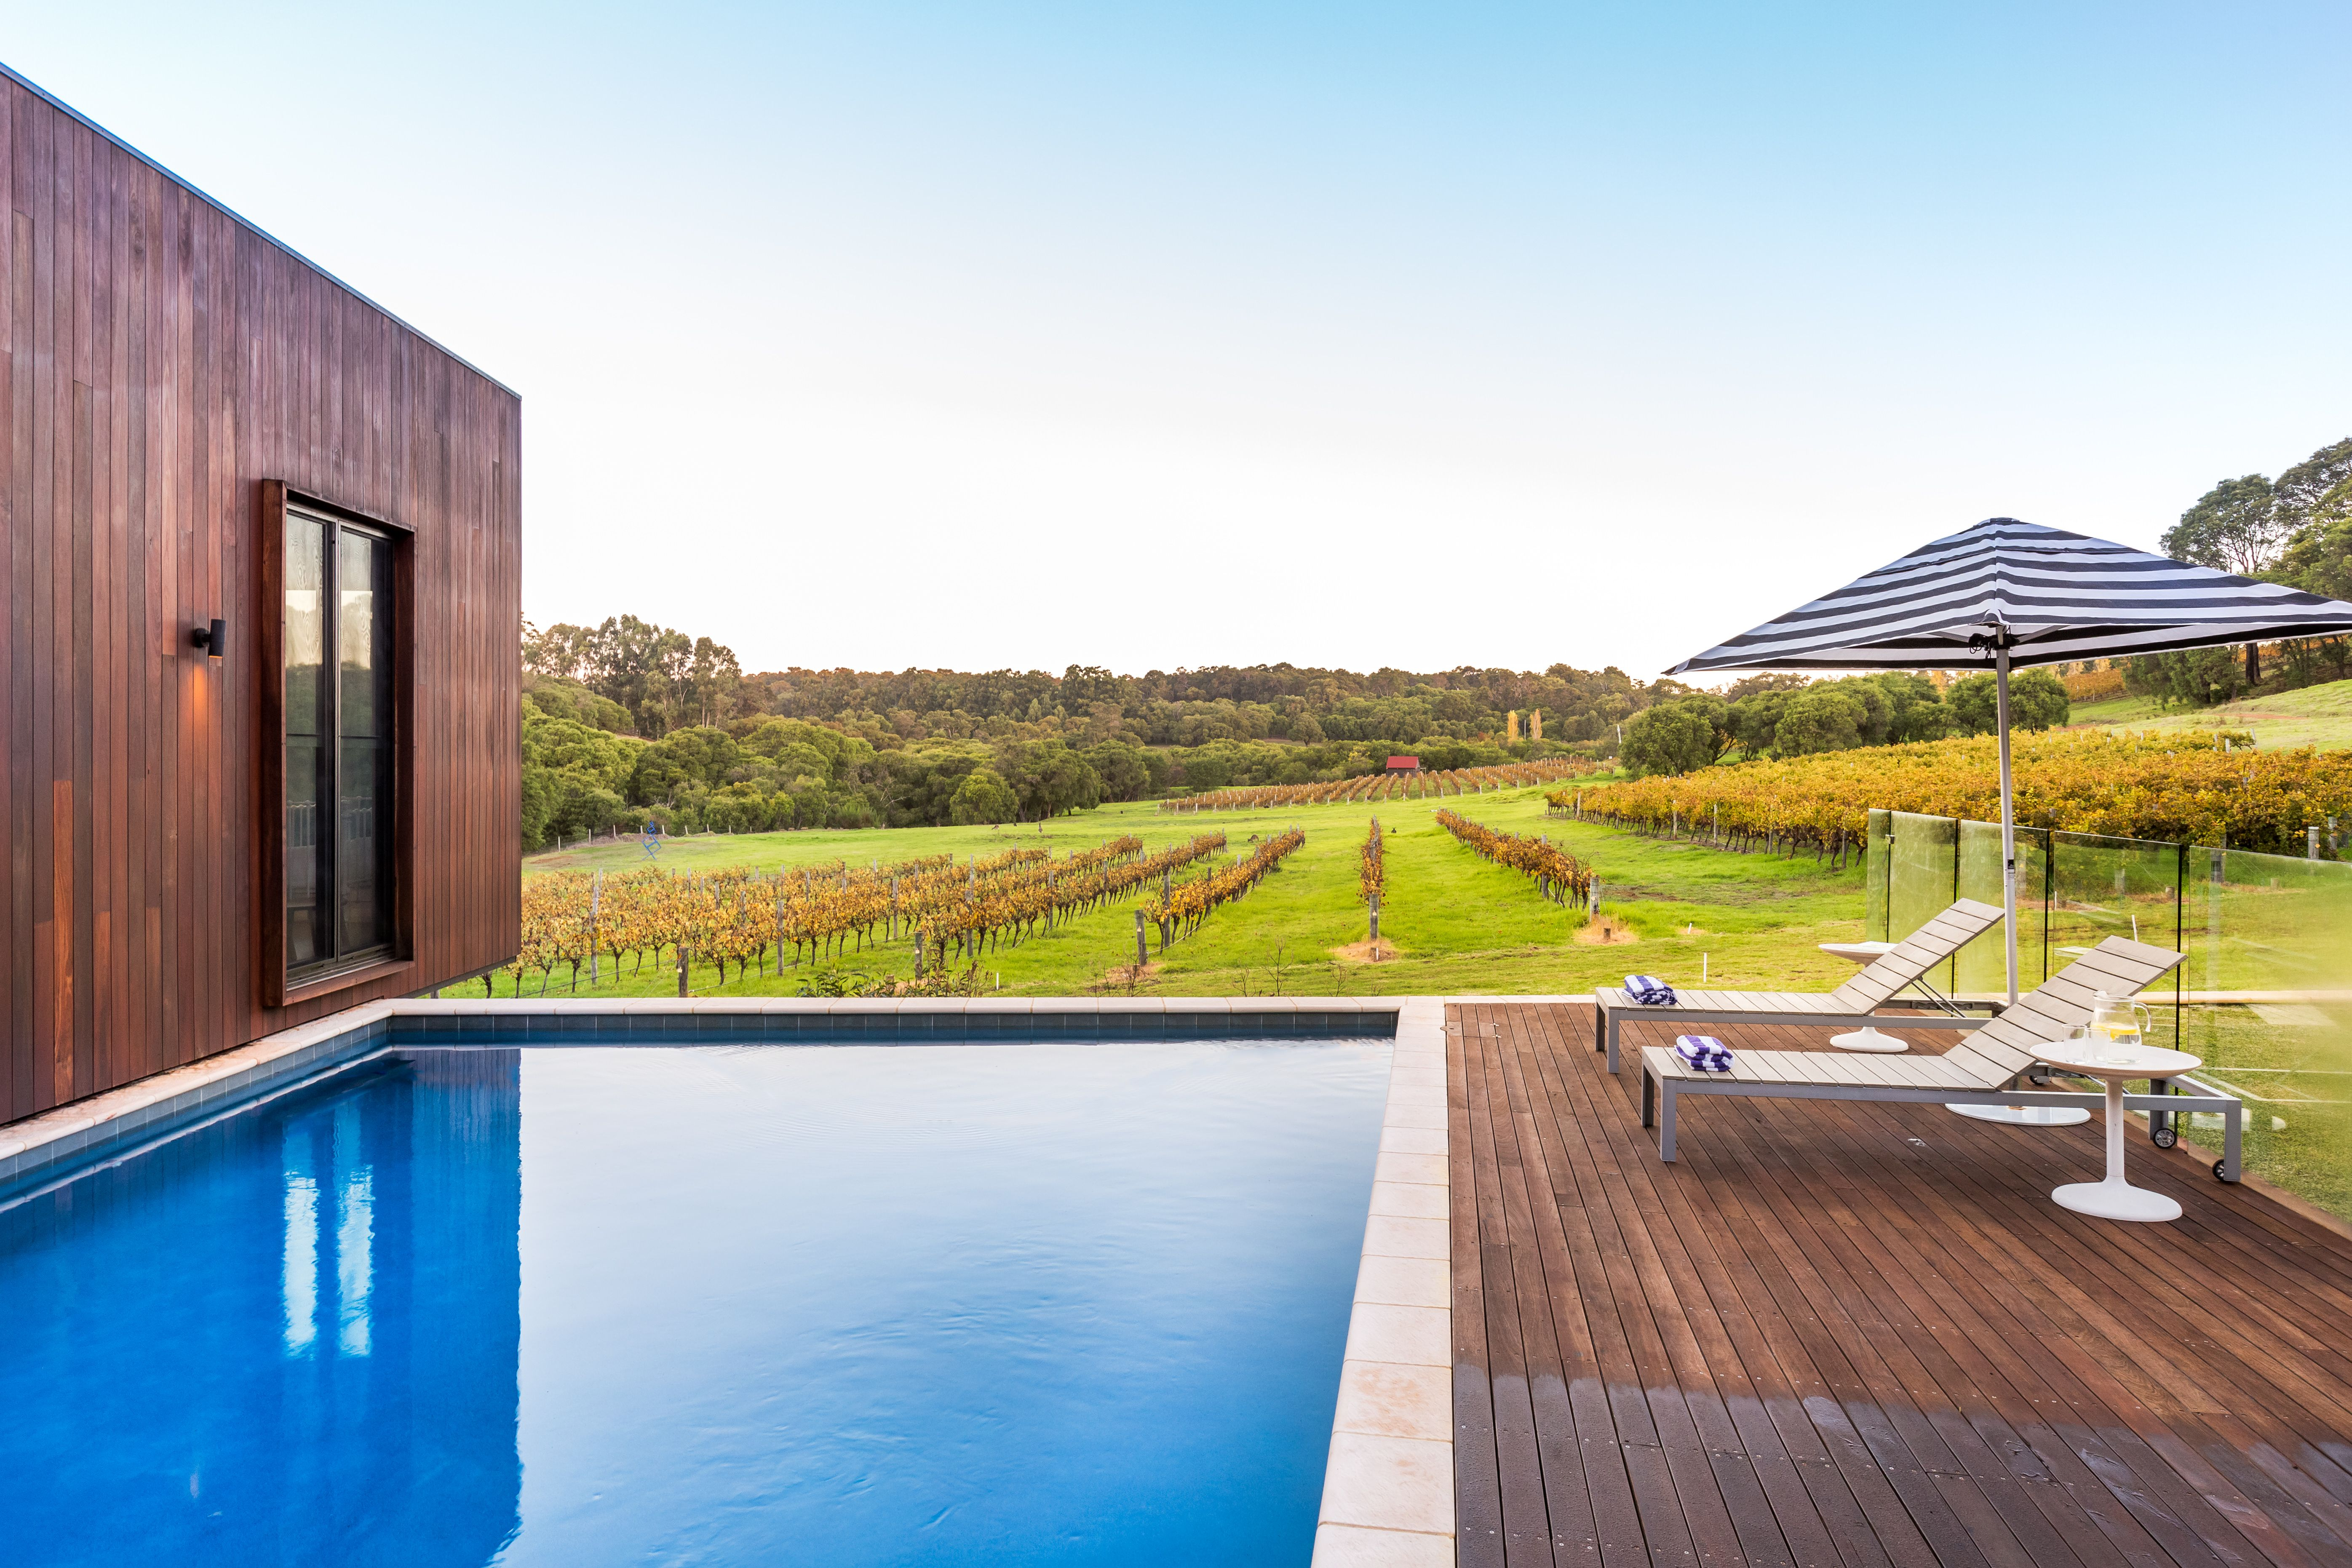 Sophie S Vineyard Margaret River Western Australia Australia Holiday Home Luxury Getaway Luxury Holidays